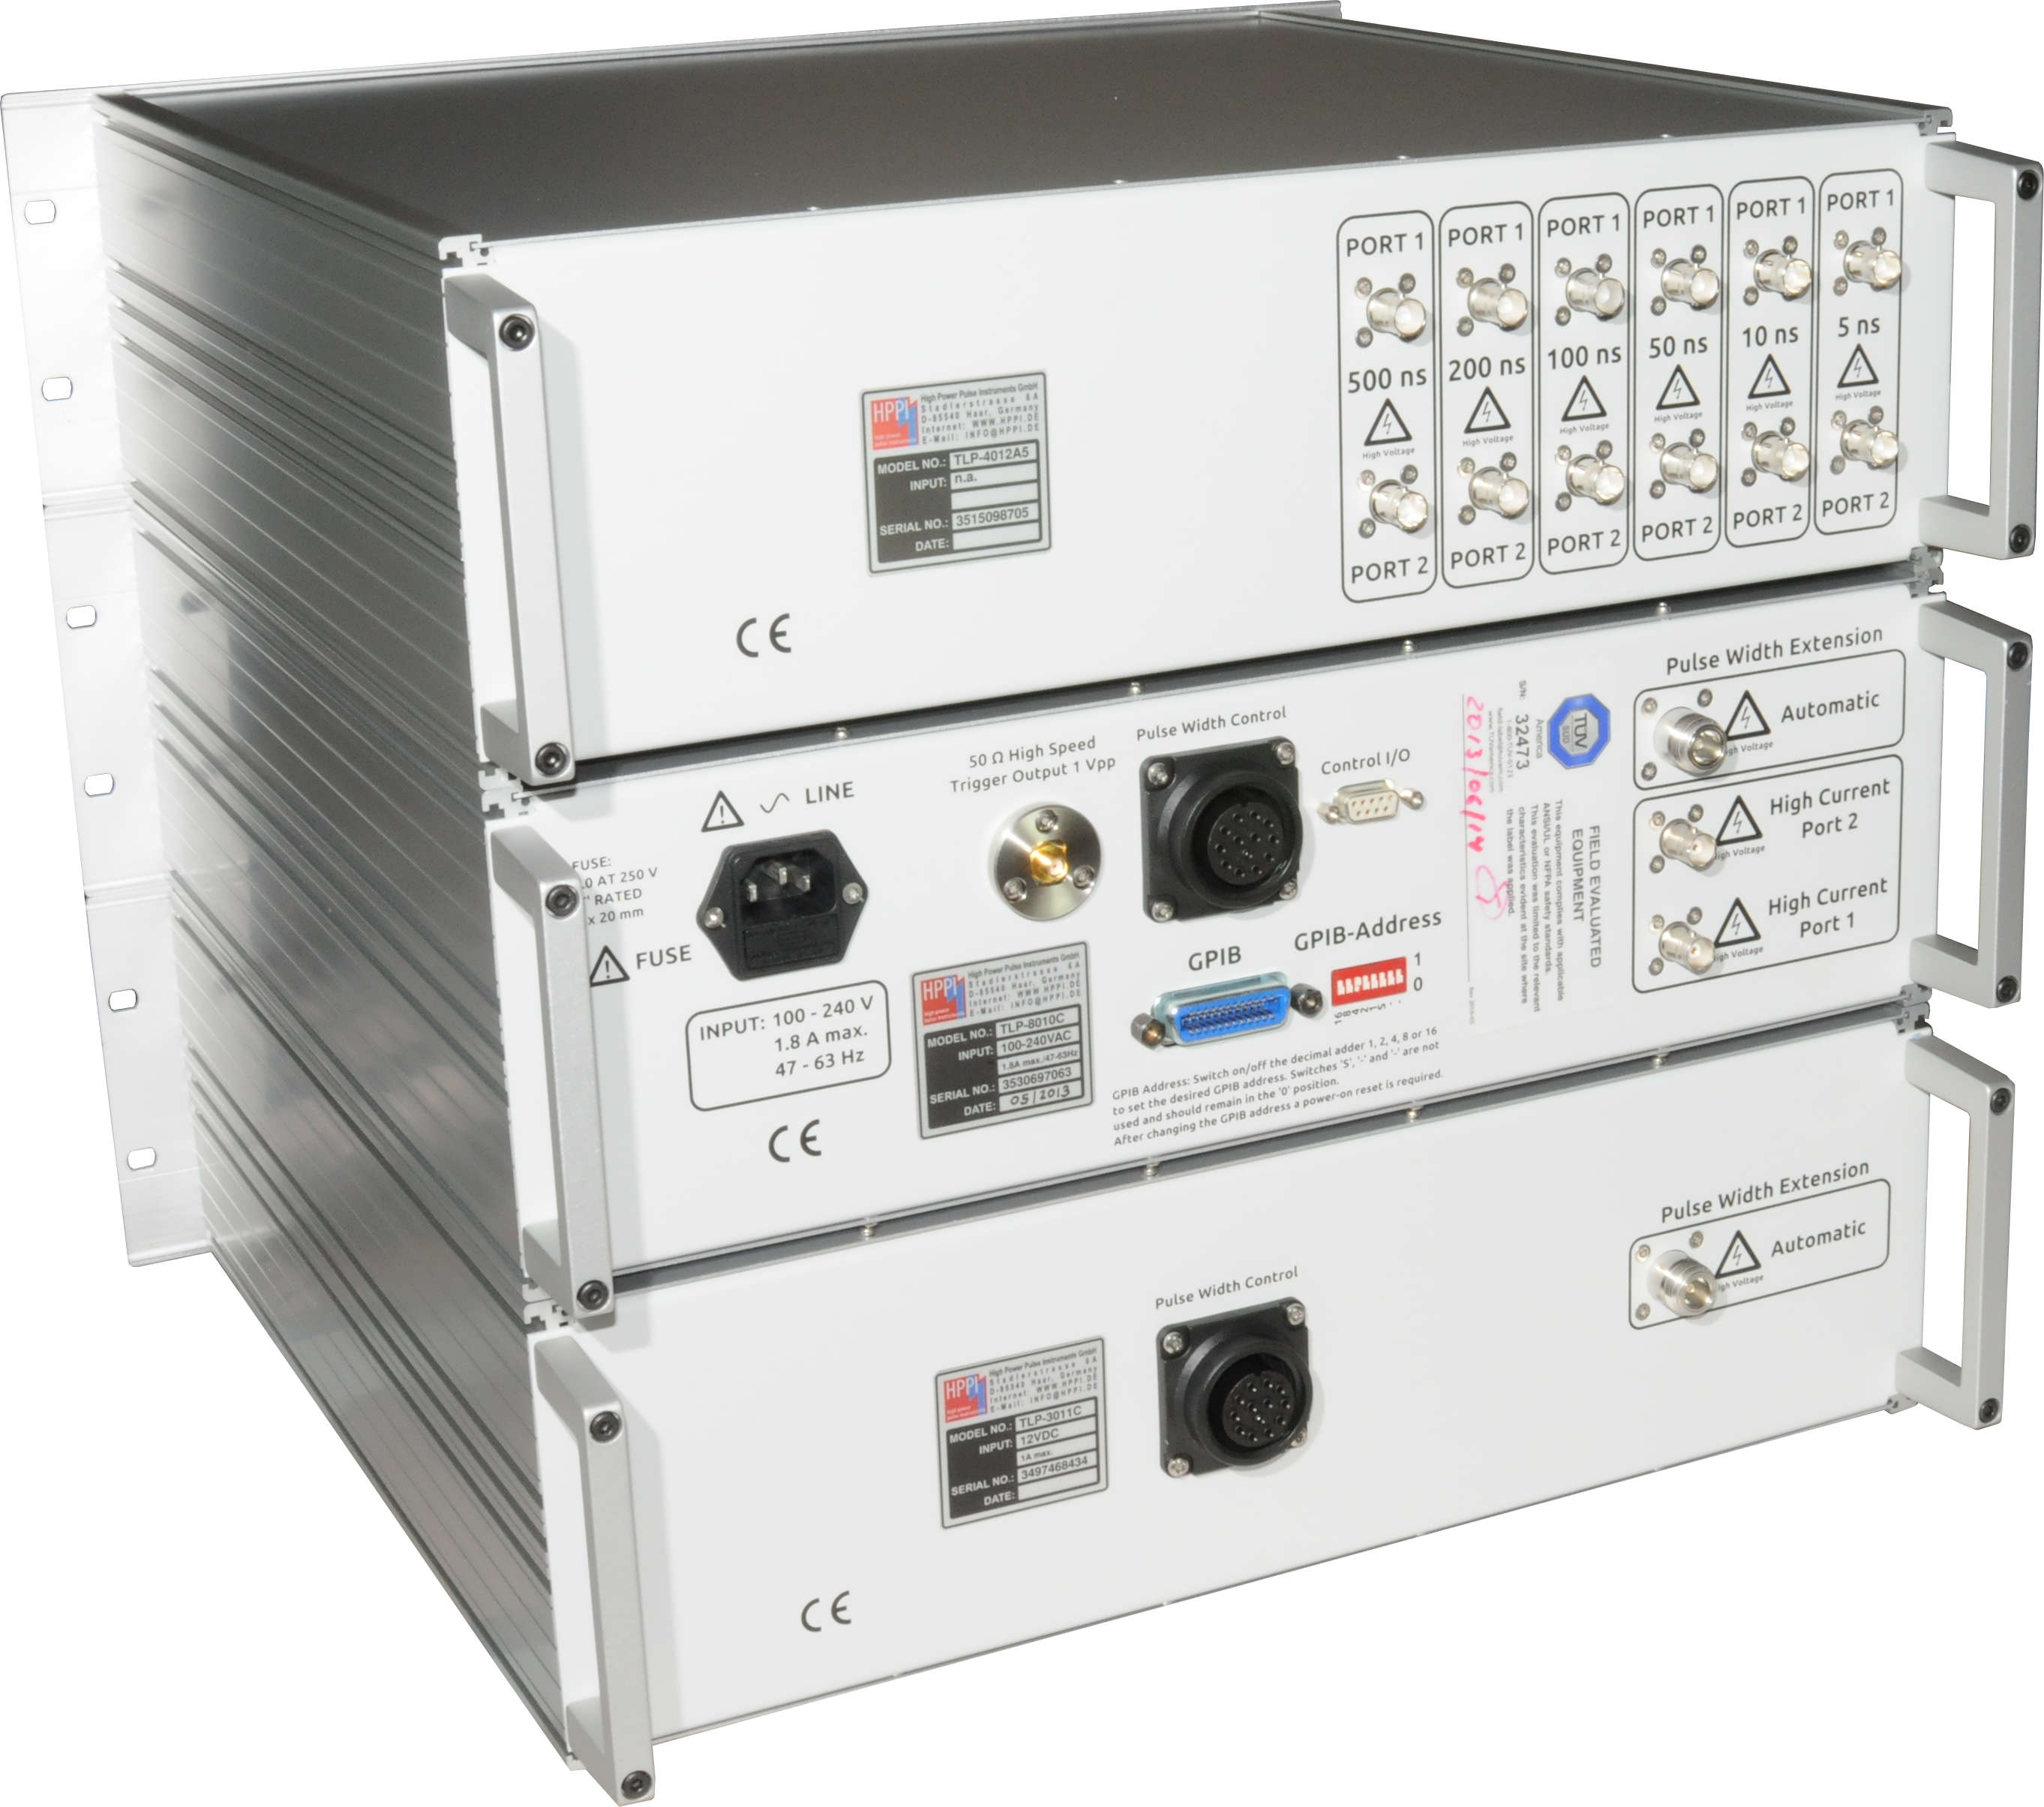 Tlp 8010c High Power Pulse Instruments Gmbh On Reset Generator Dsc 4588s